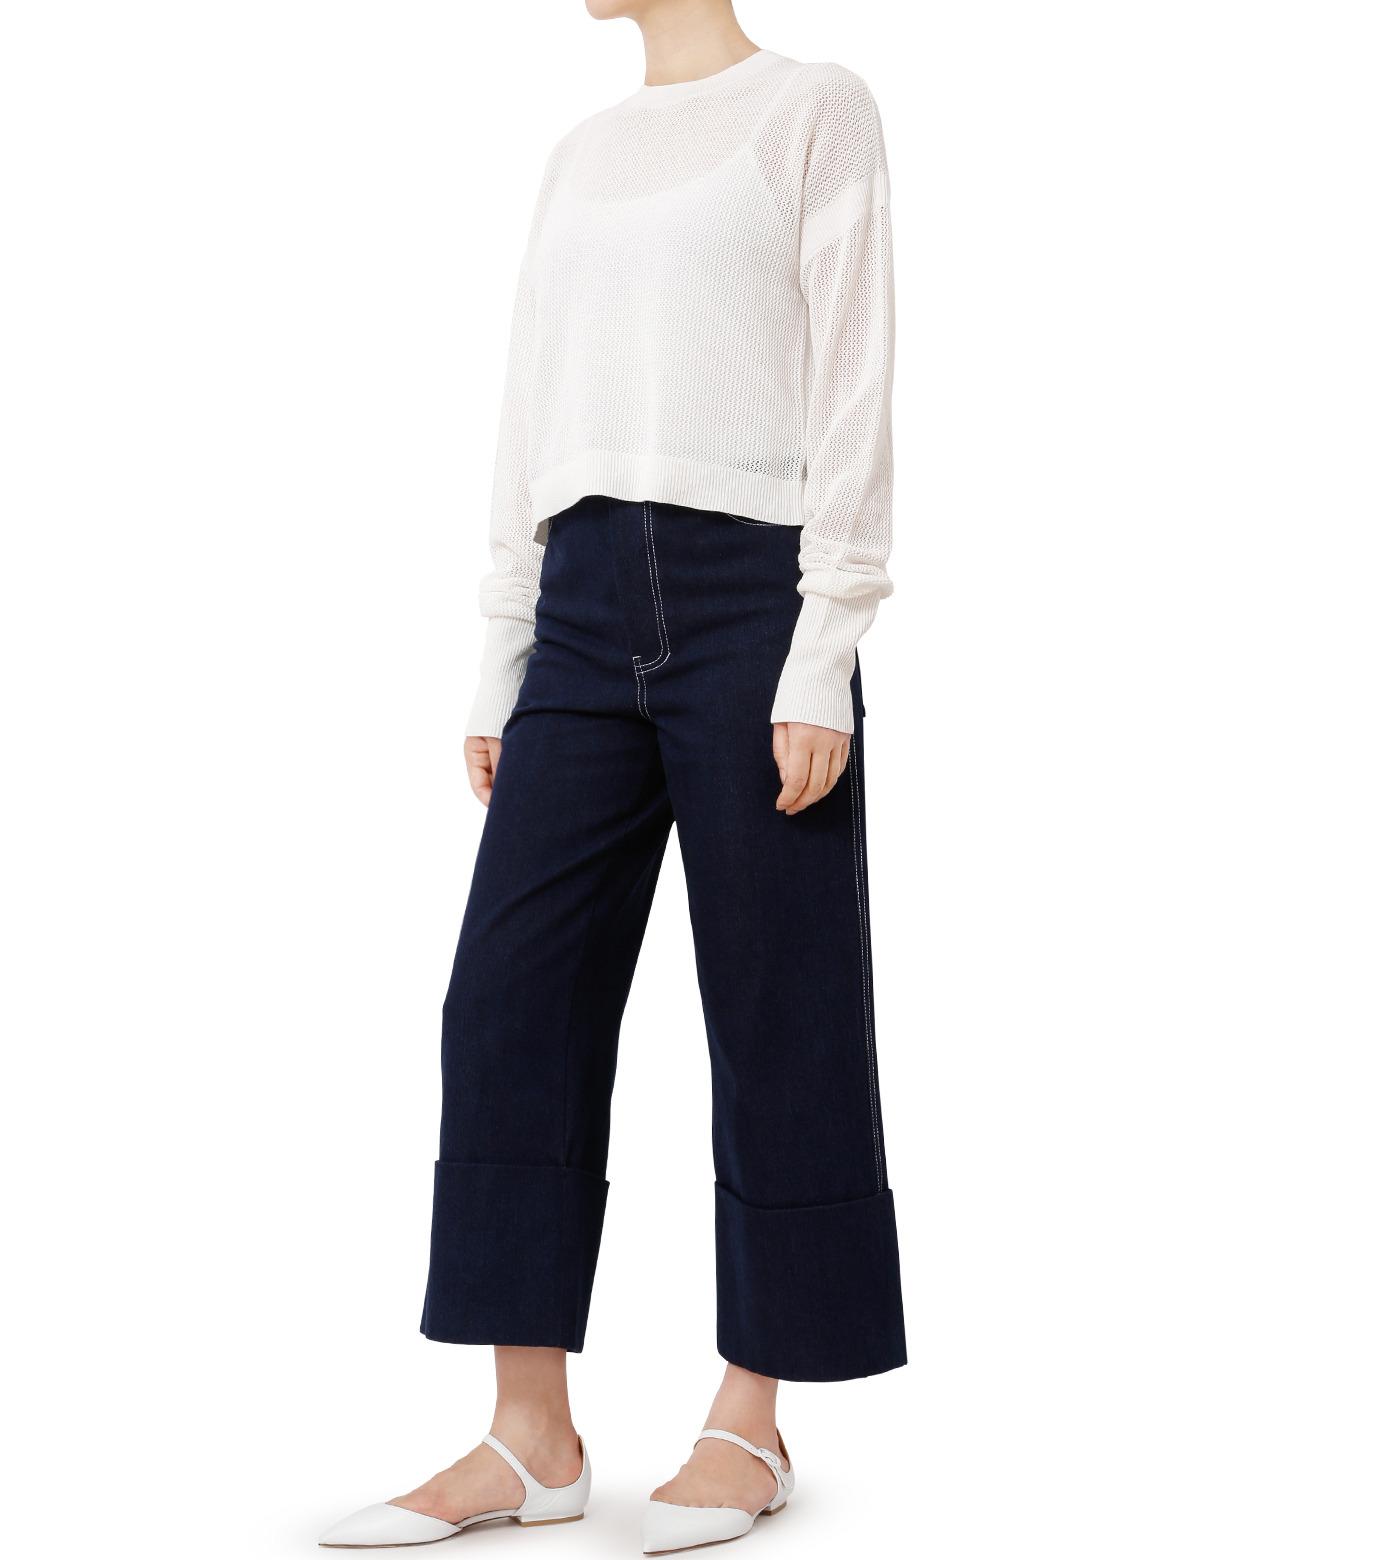 LE CIEL BLEU(ルシェルブルー)のデニムフォールドバックパンツ-INDIGO(パンツ/pants)-18A68304 拡大詳細画像3